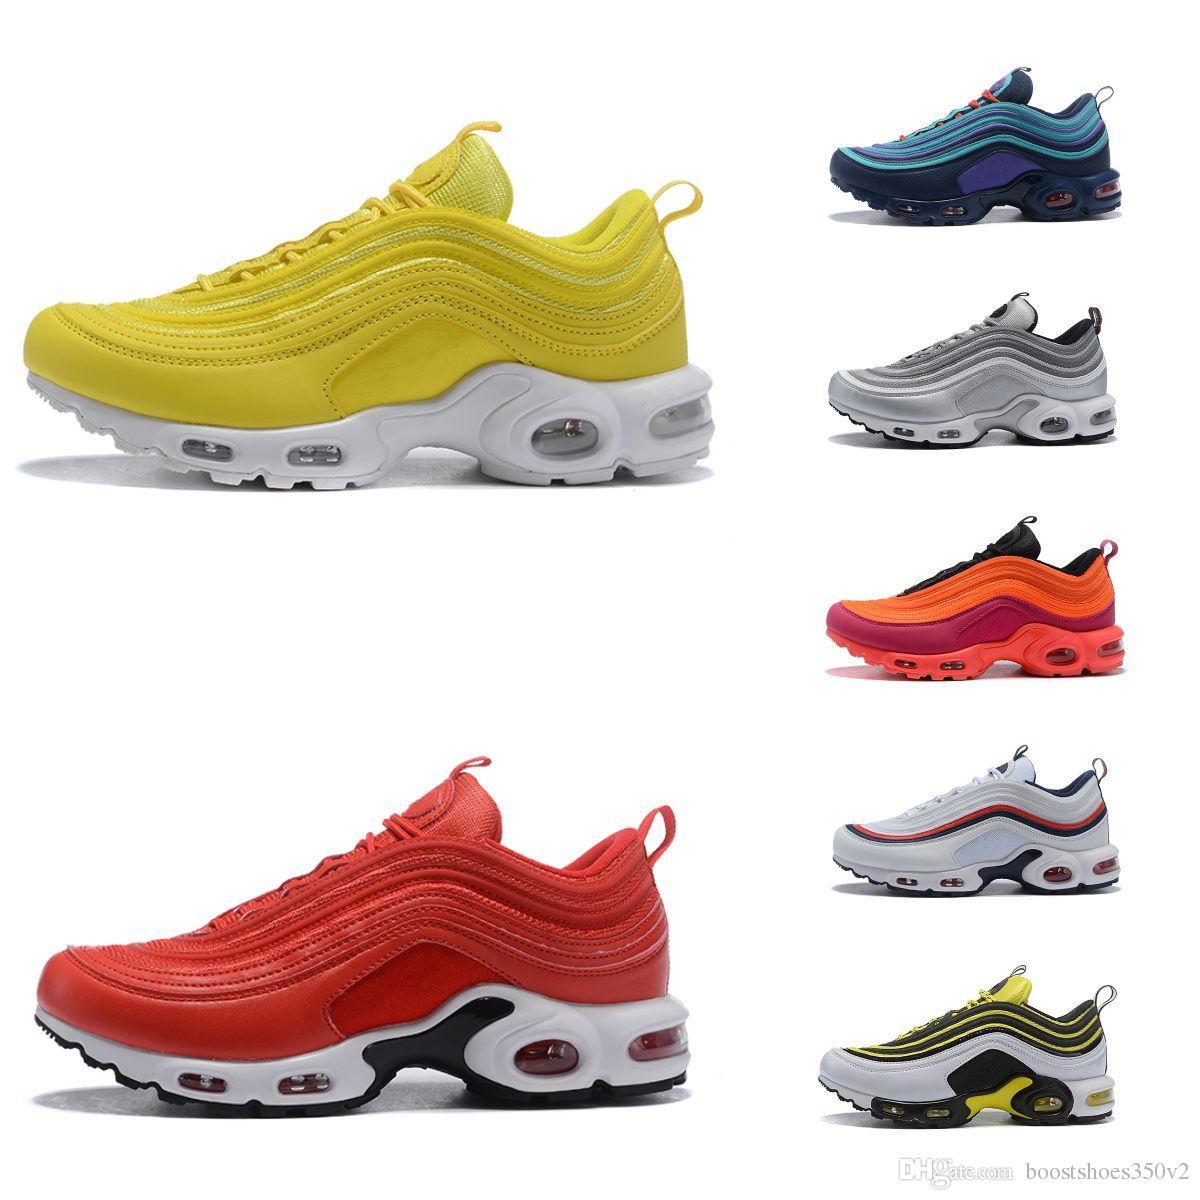 73b7d07160785 2019 TN Plus Running Shoes Black White Grey Red Yellow Blue Cushion  Trainers 97 TN Men Women Designer Shoes Size 36 46 Shoes For Men Mens  Running Shoes From ...